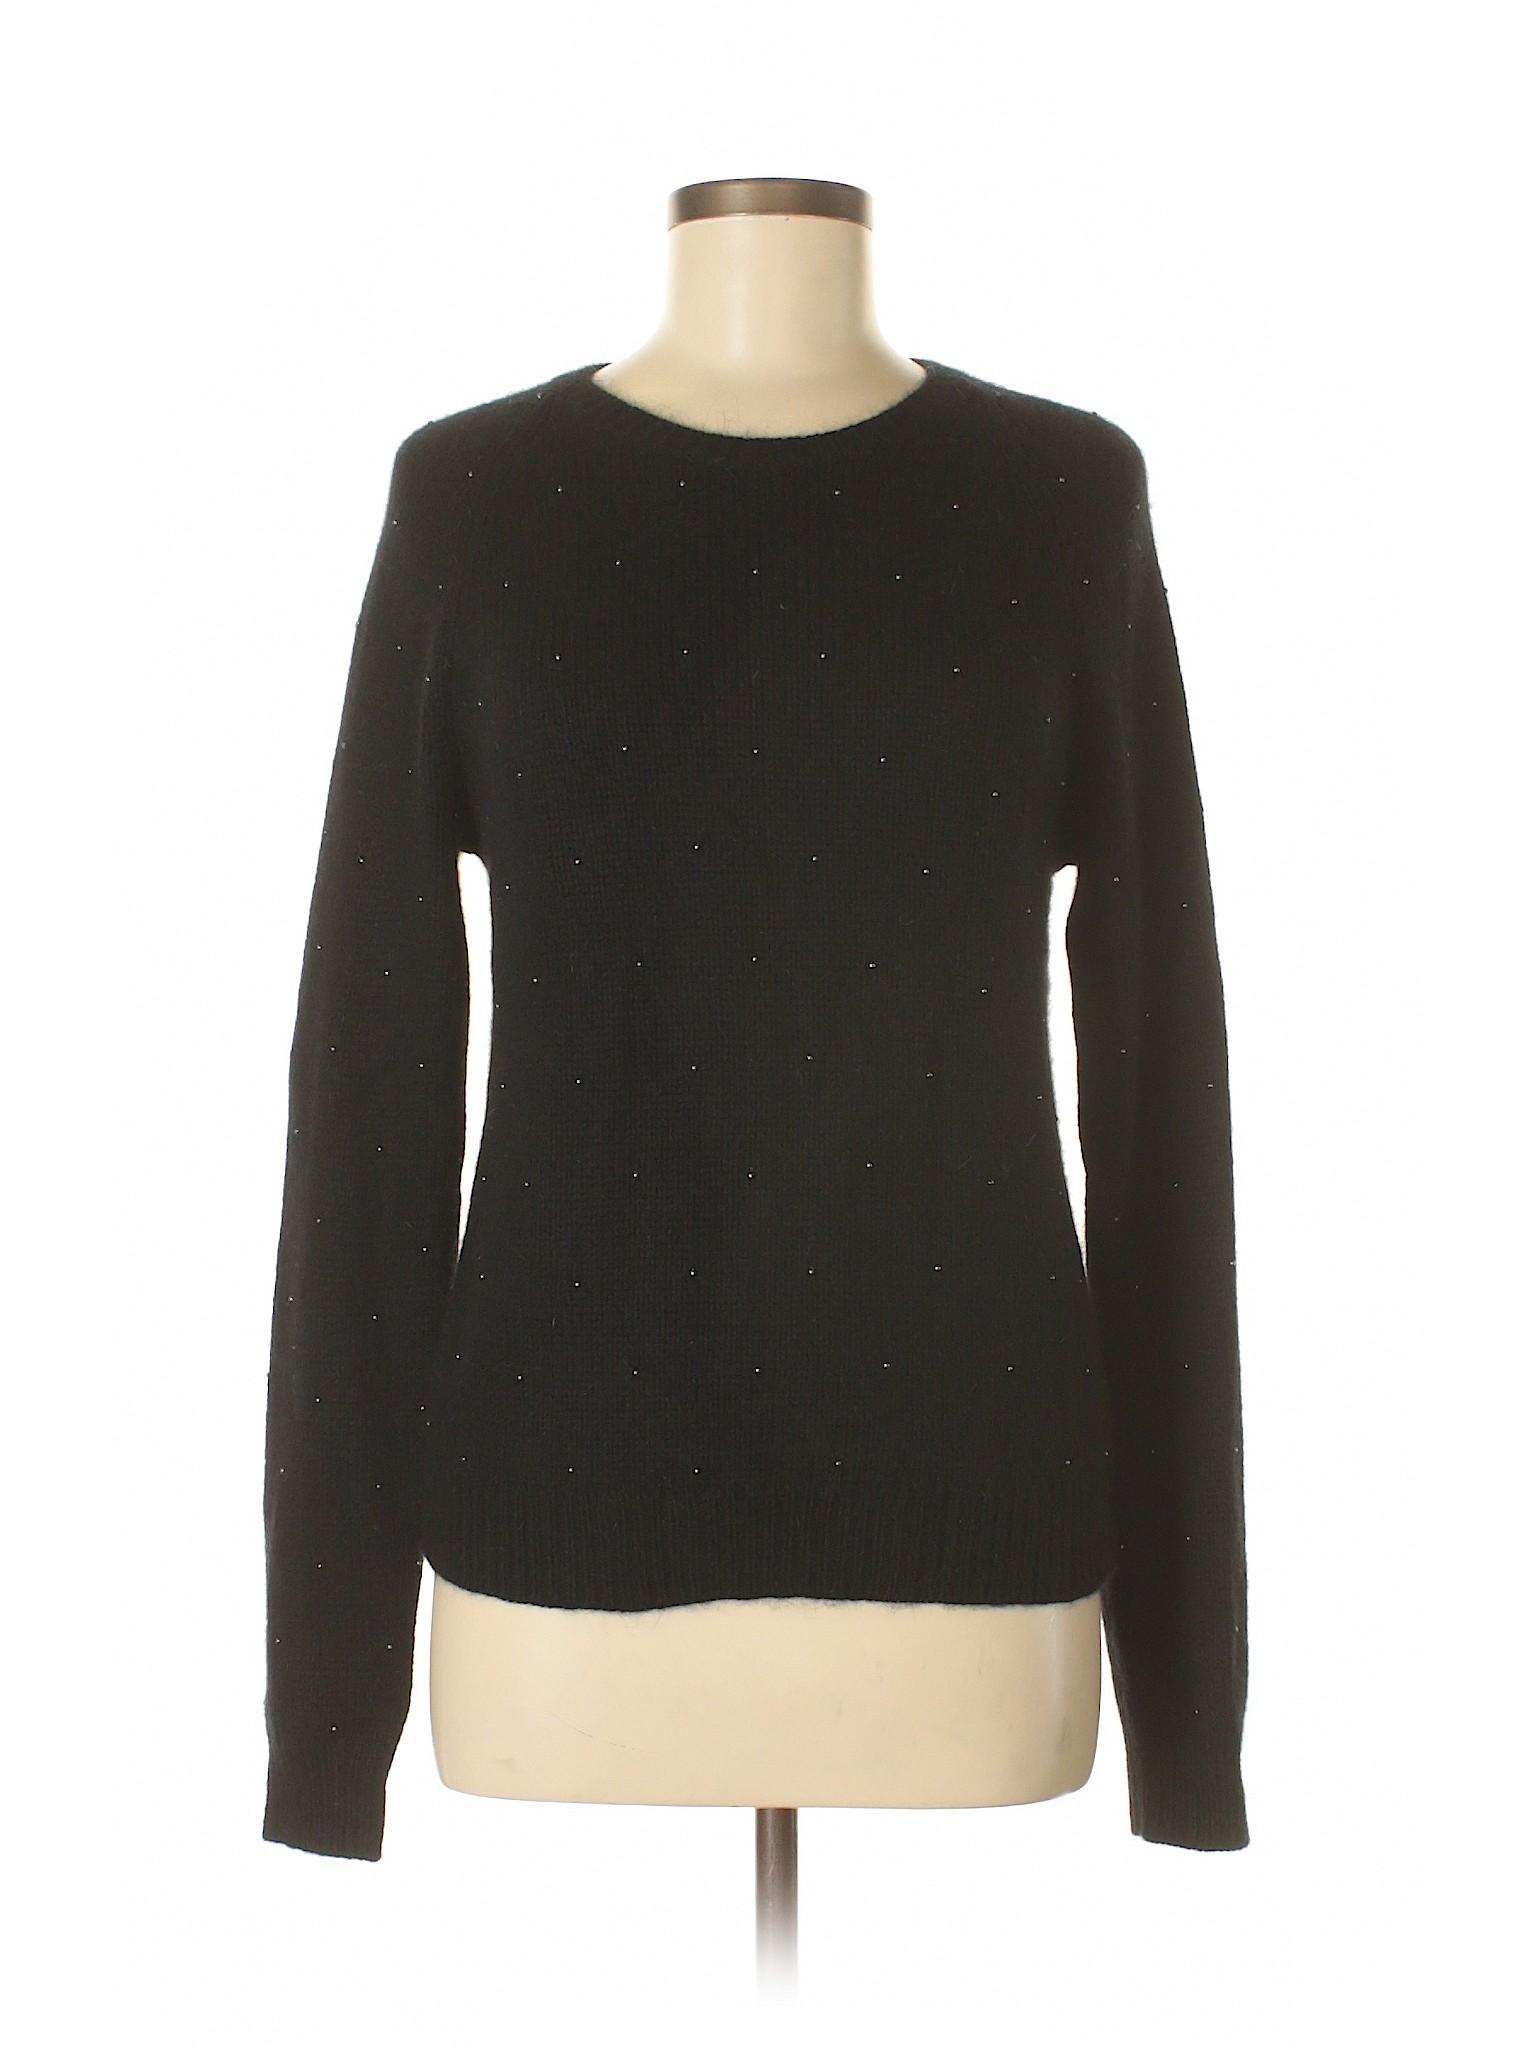 Boutique Pullover Melani Sweater Sweater Melani Boutique Pullover Pullover Boutique Antonio Melani Antonio Antonio wIIAO8xf